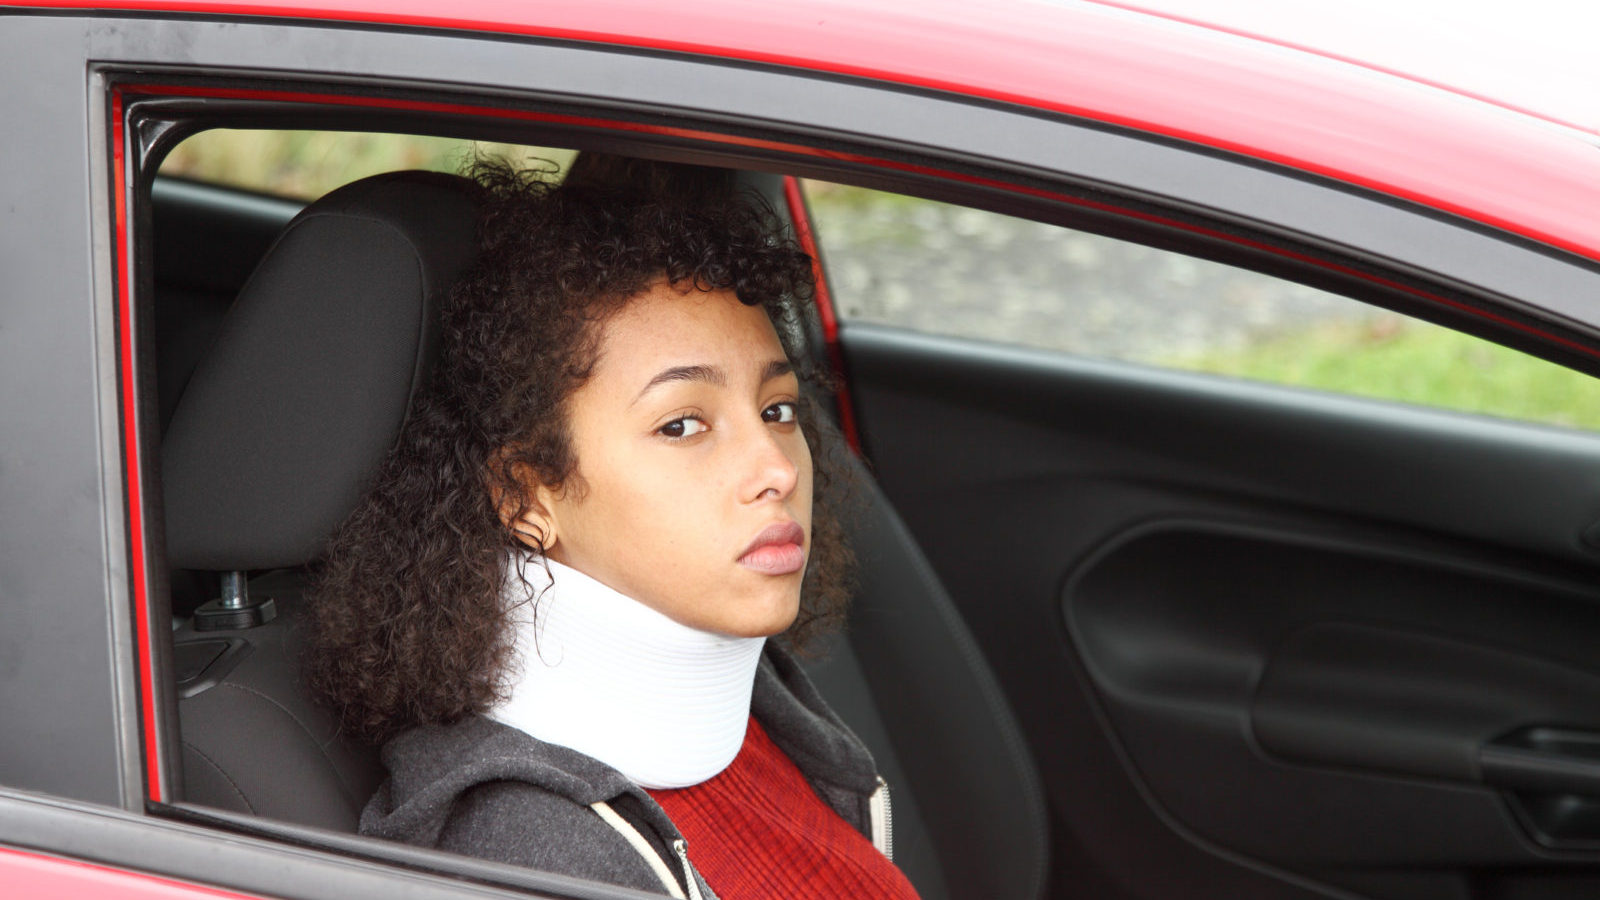 female wearing neck brace in car-whiplash insurance theme